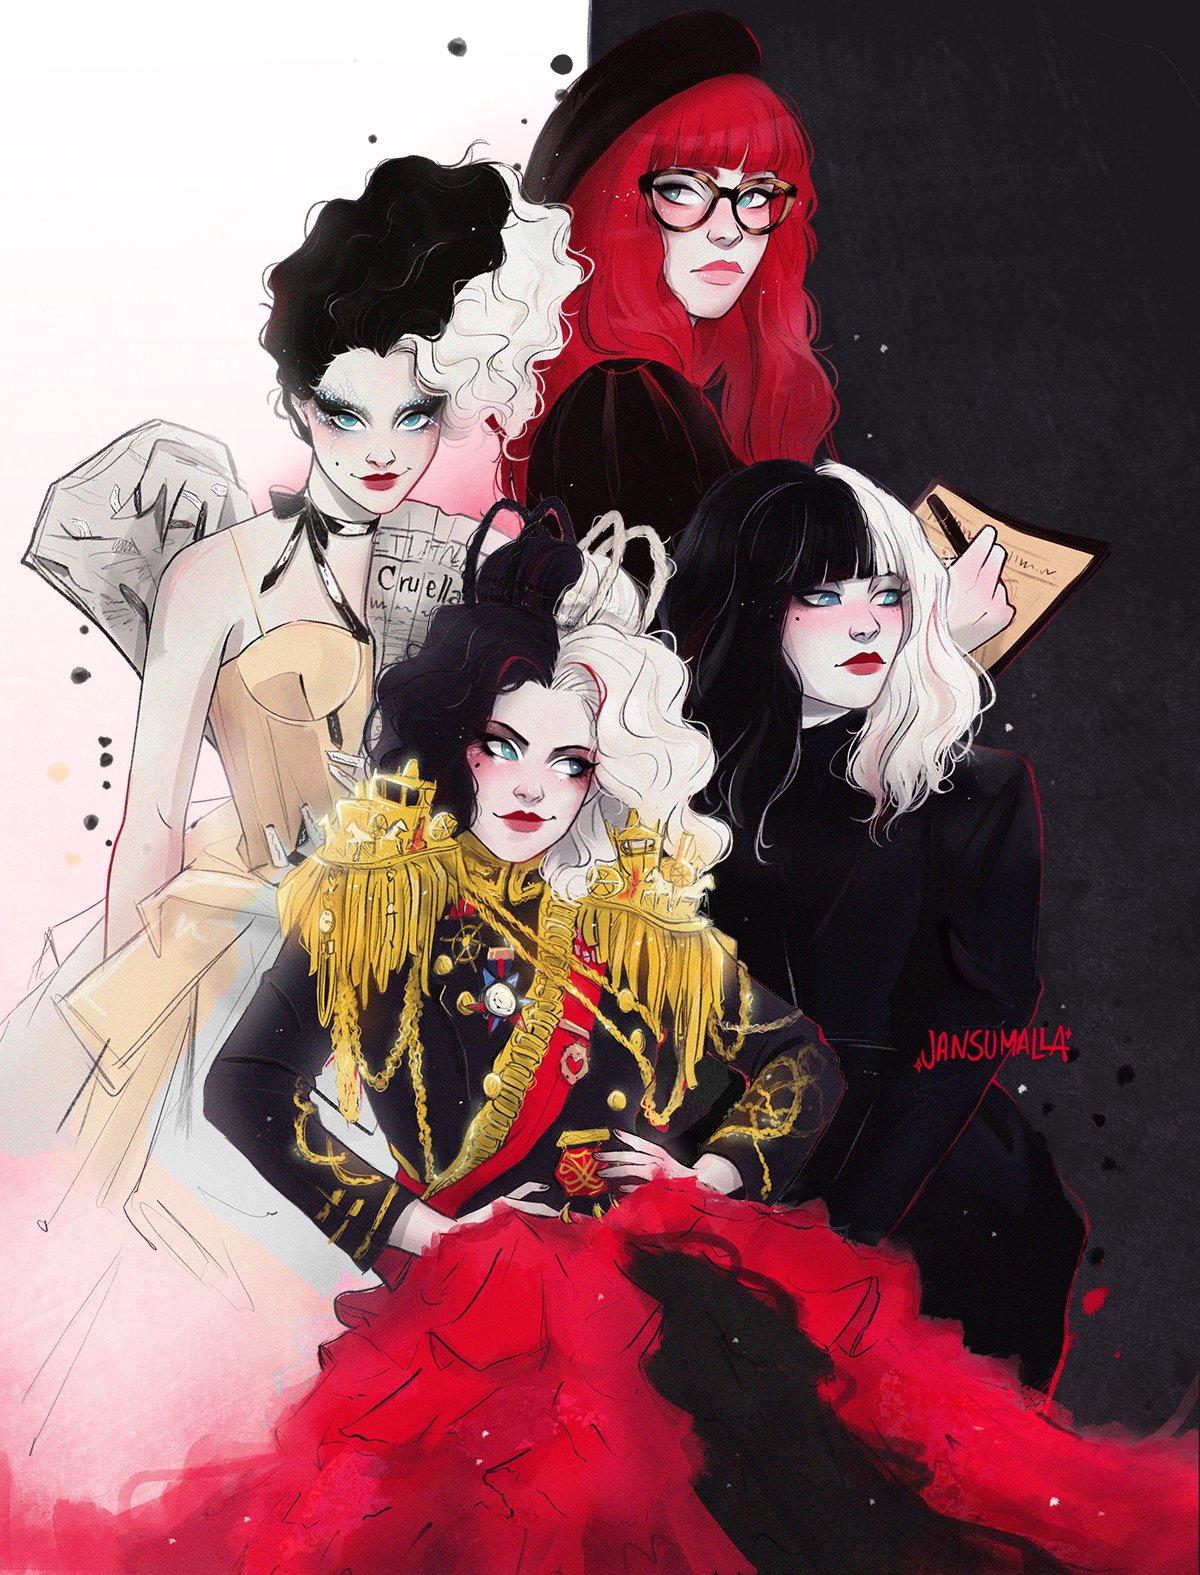 Cruella by Jansumalla